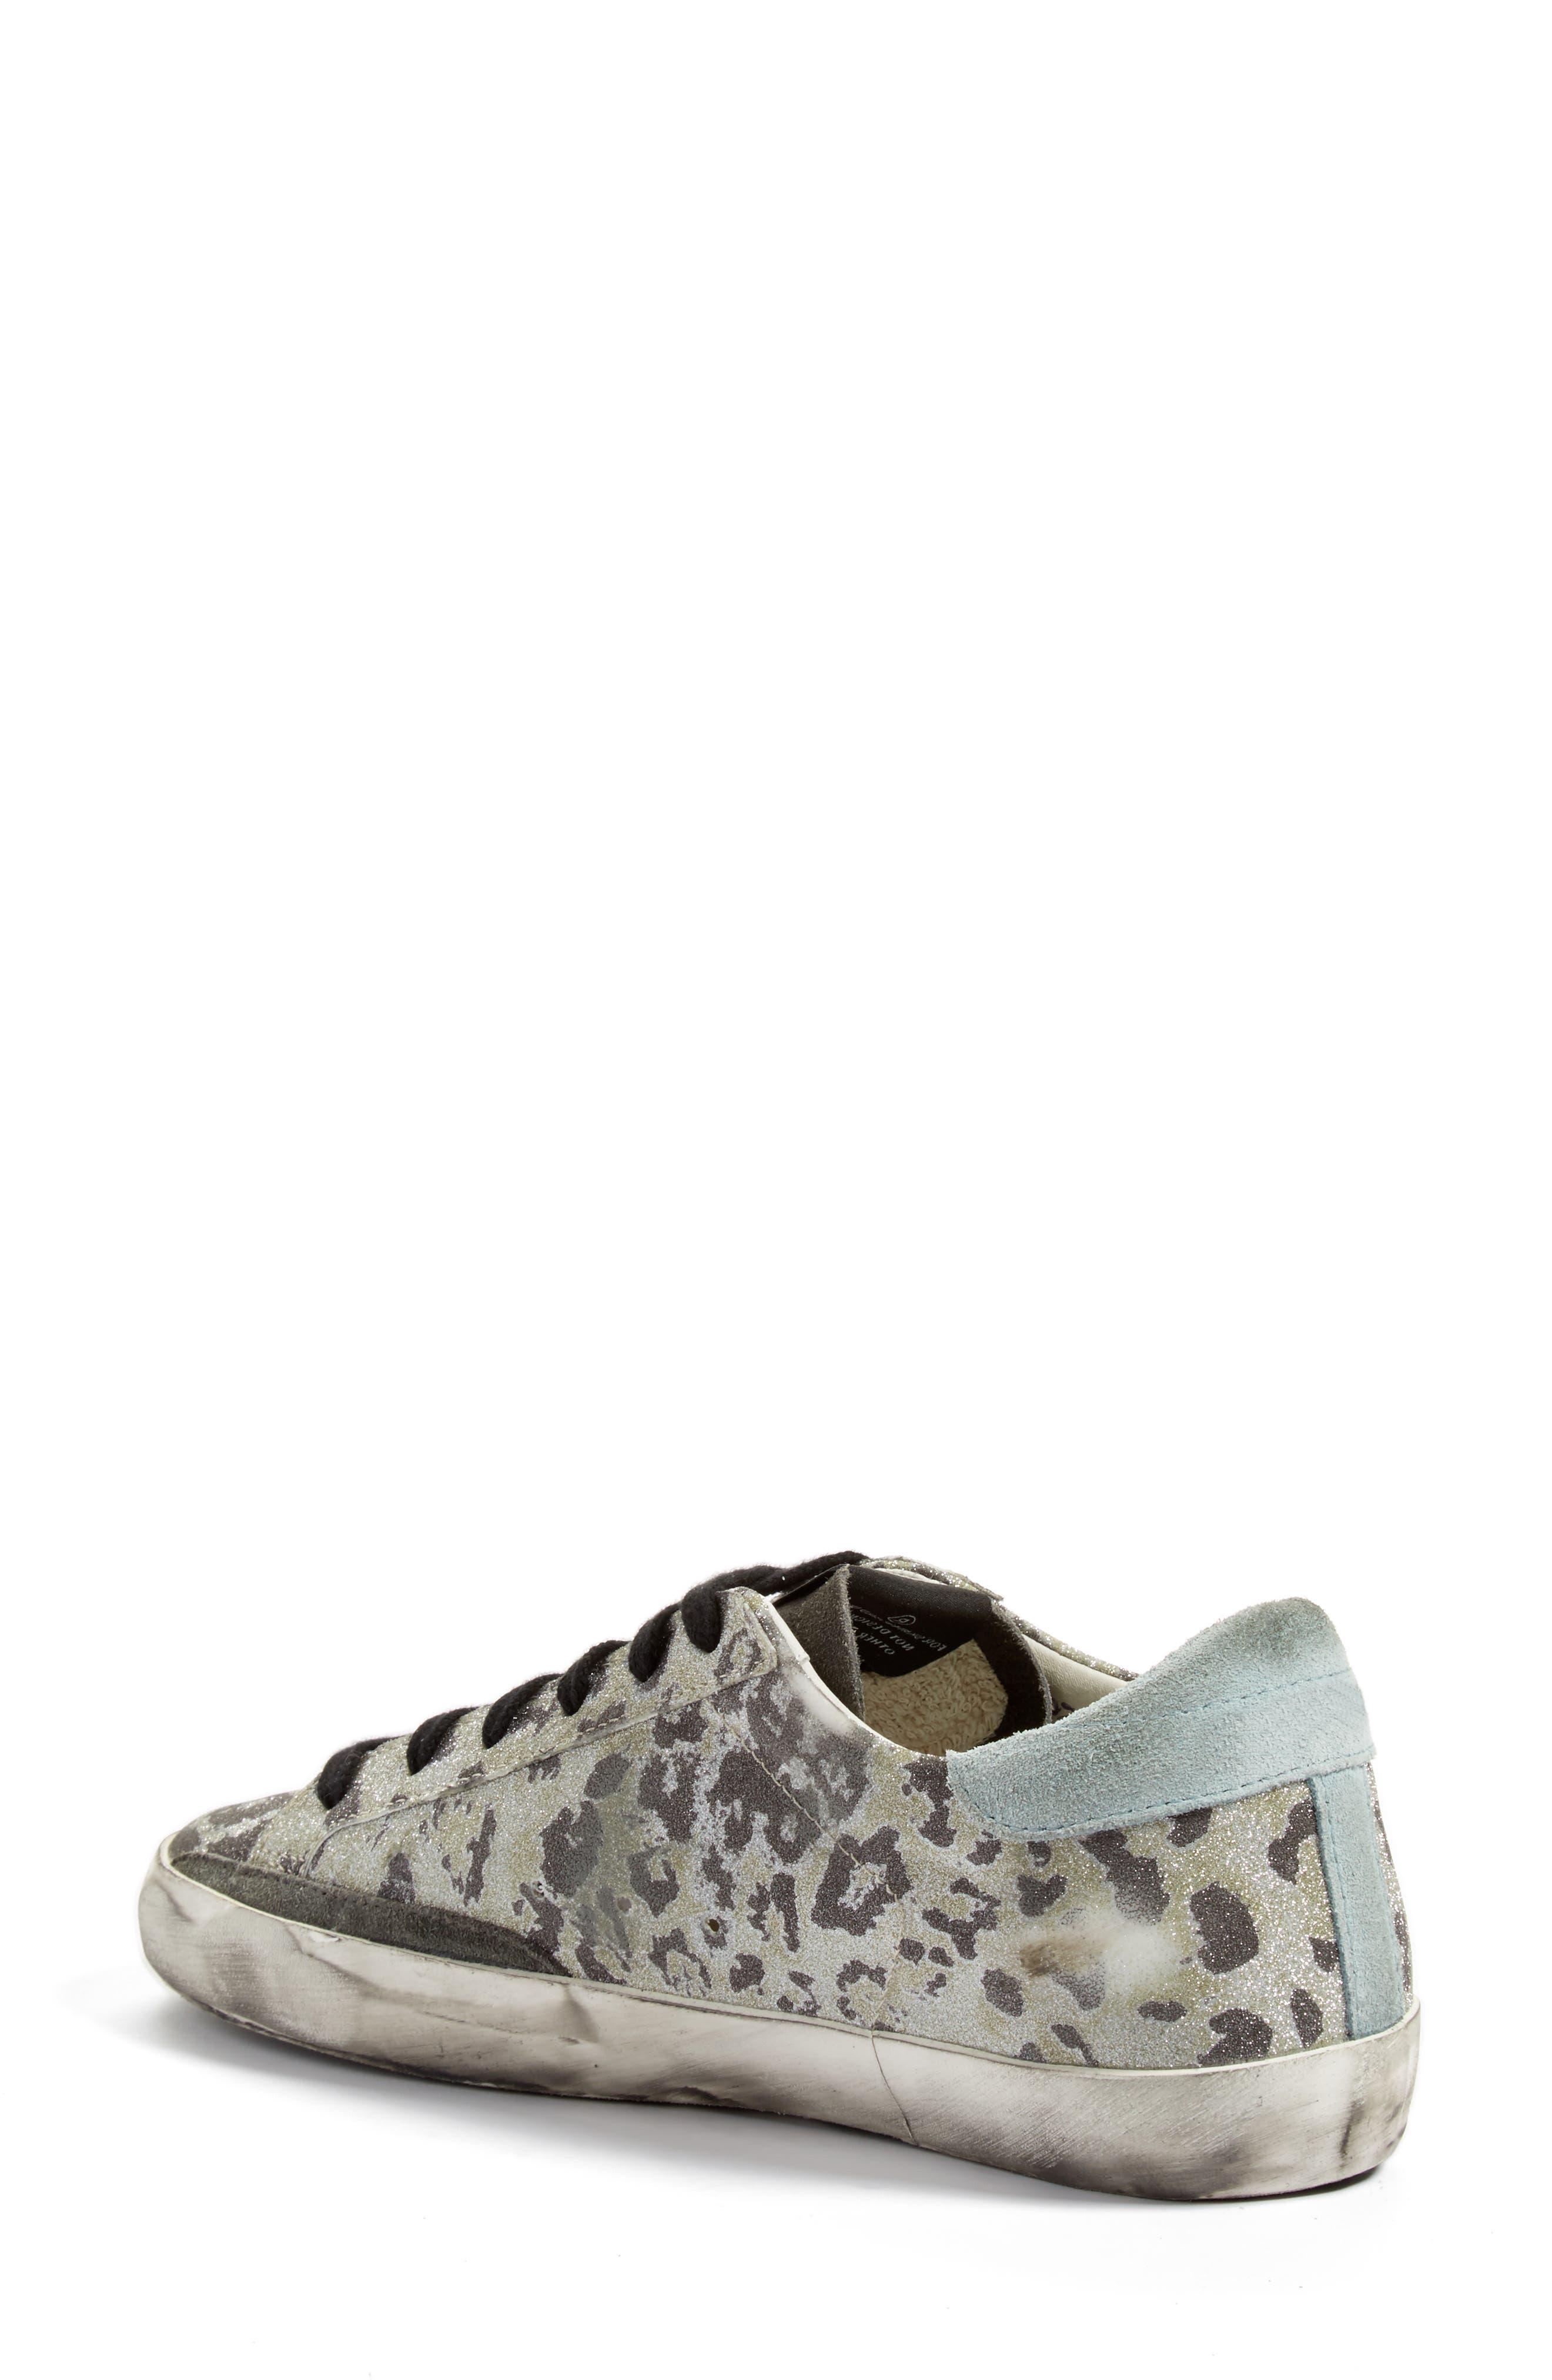 Golden Goose Cheetah Superstar Sneaker